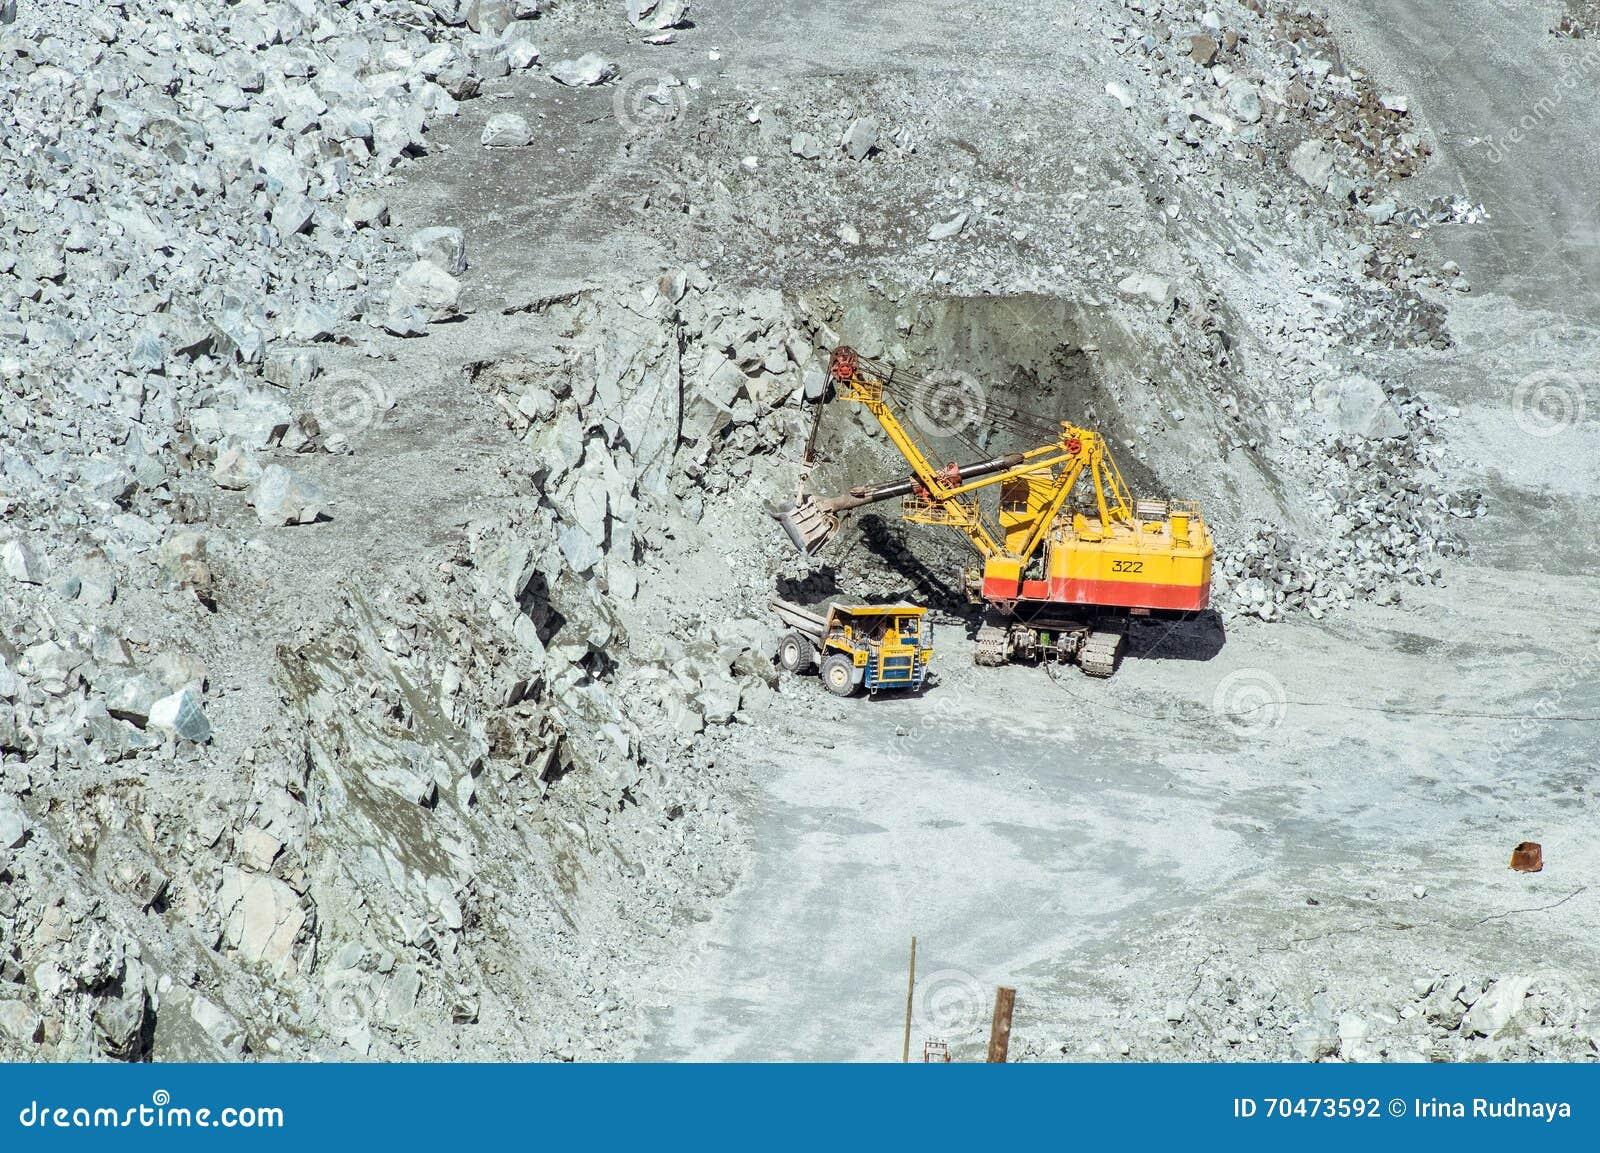 Asbestos Mining In Us : Quarry mining of asbestos urals russia editorial